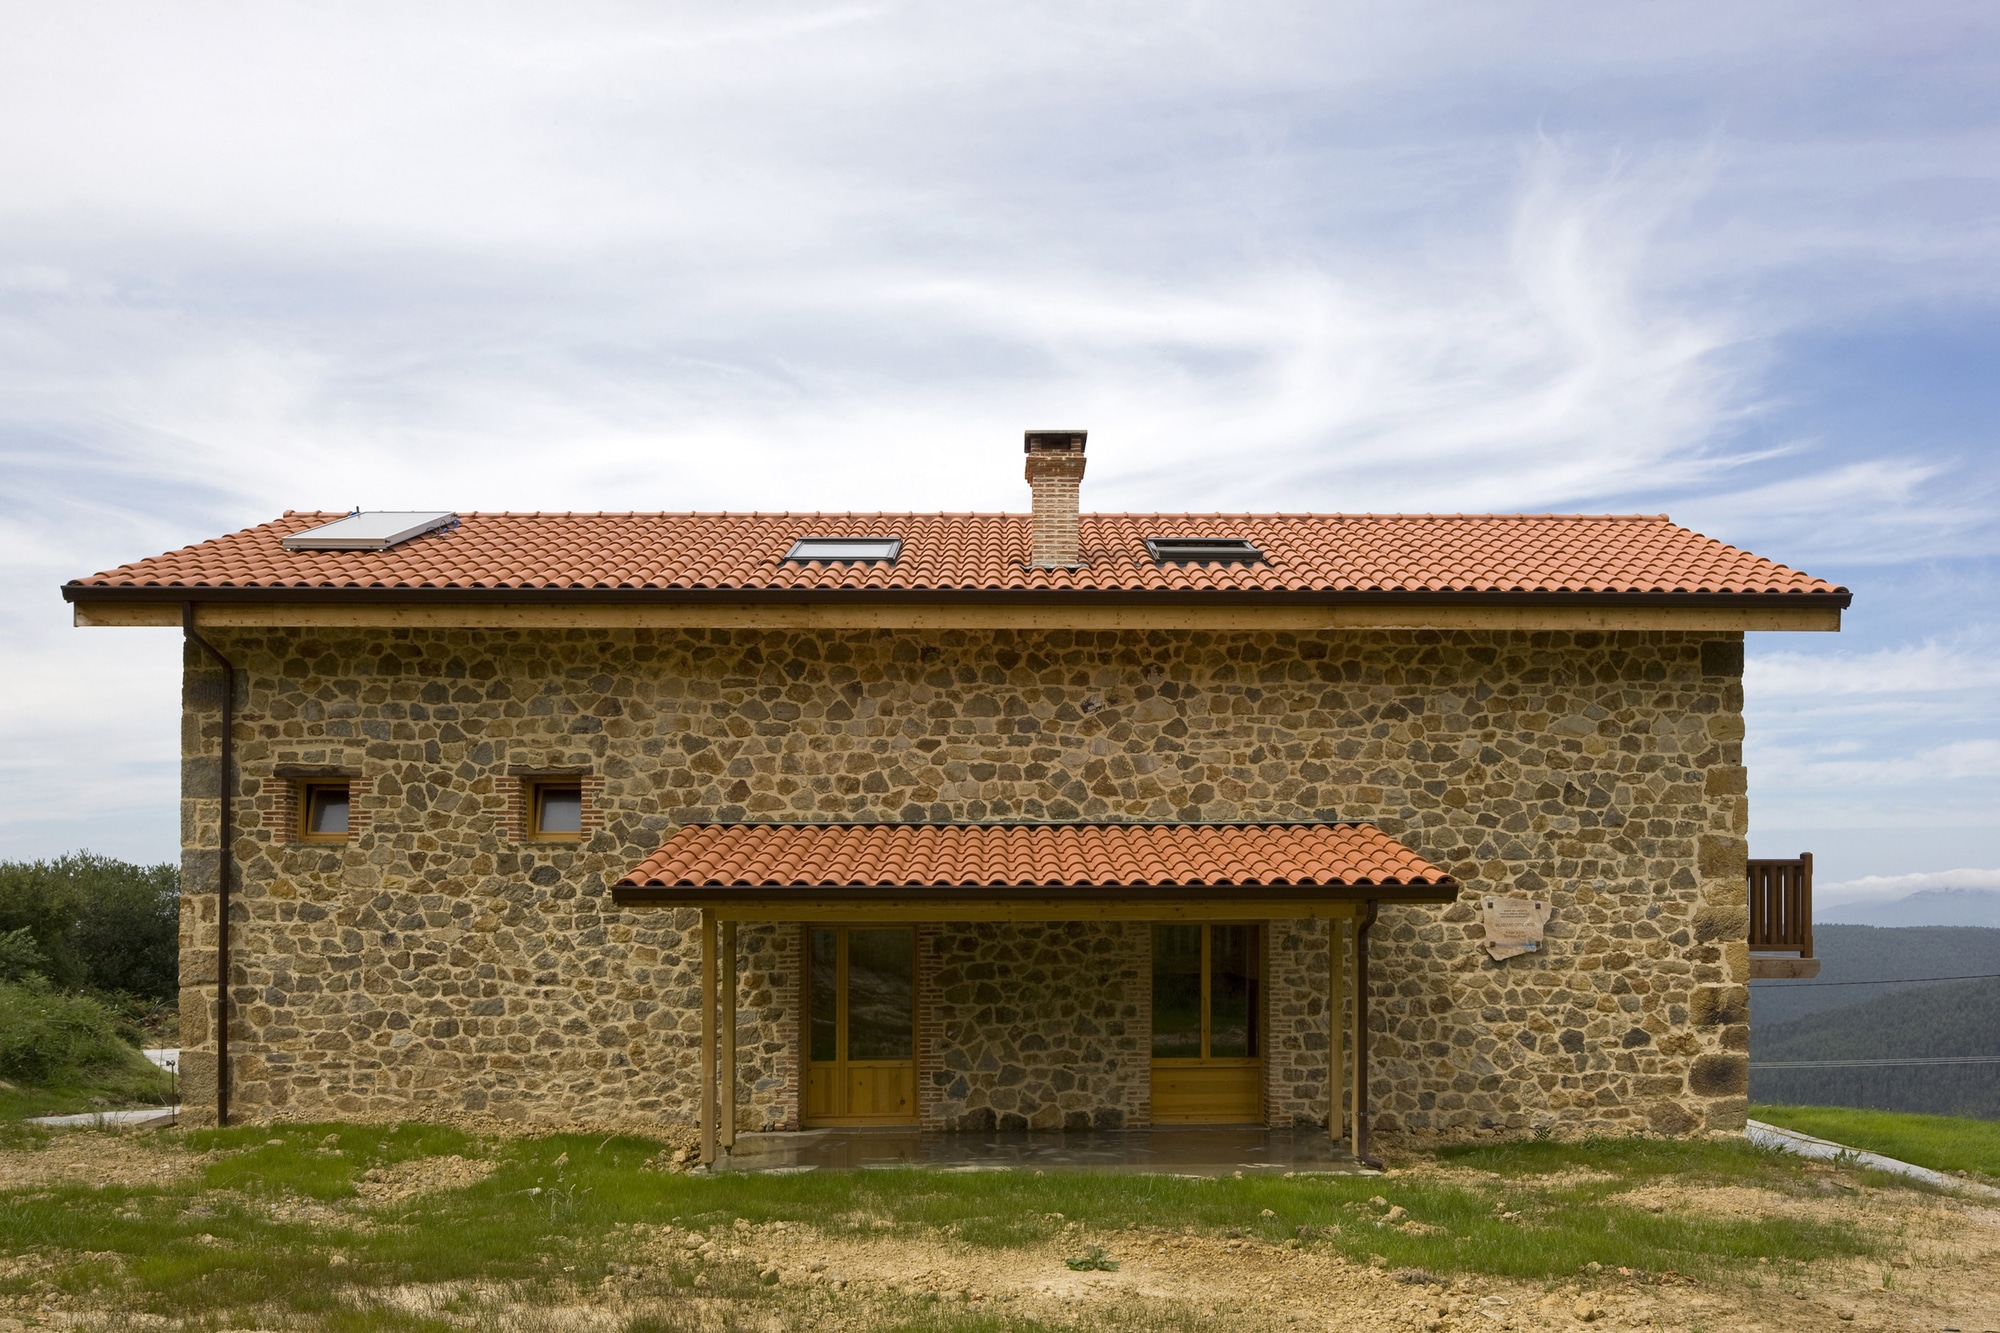 Dise o de casa r stica de piedra planos construye hogar - Diseno casas rusticas ...